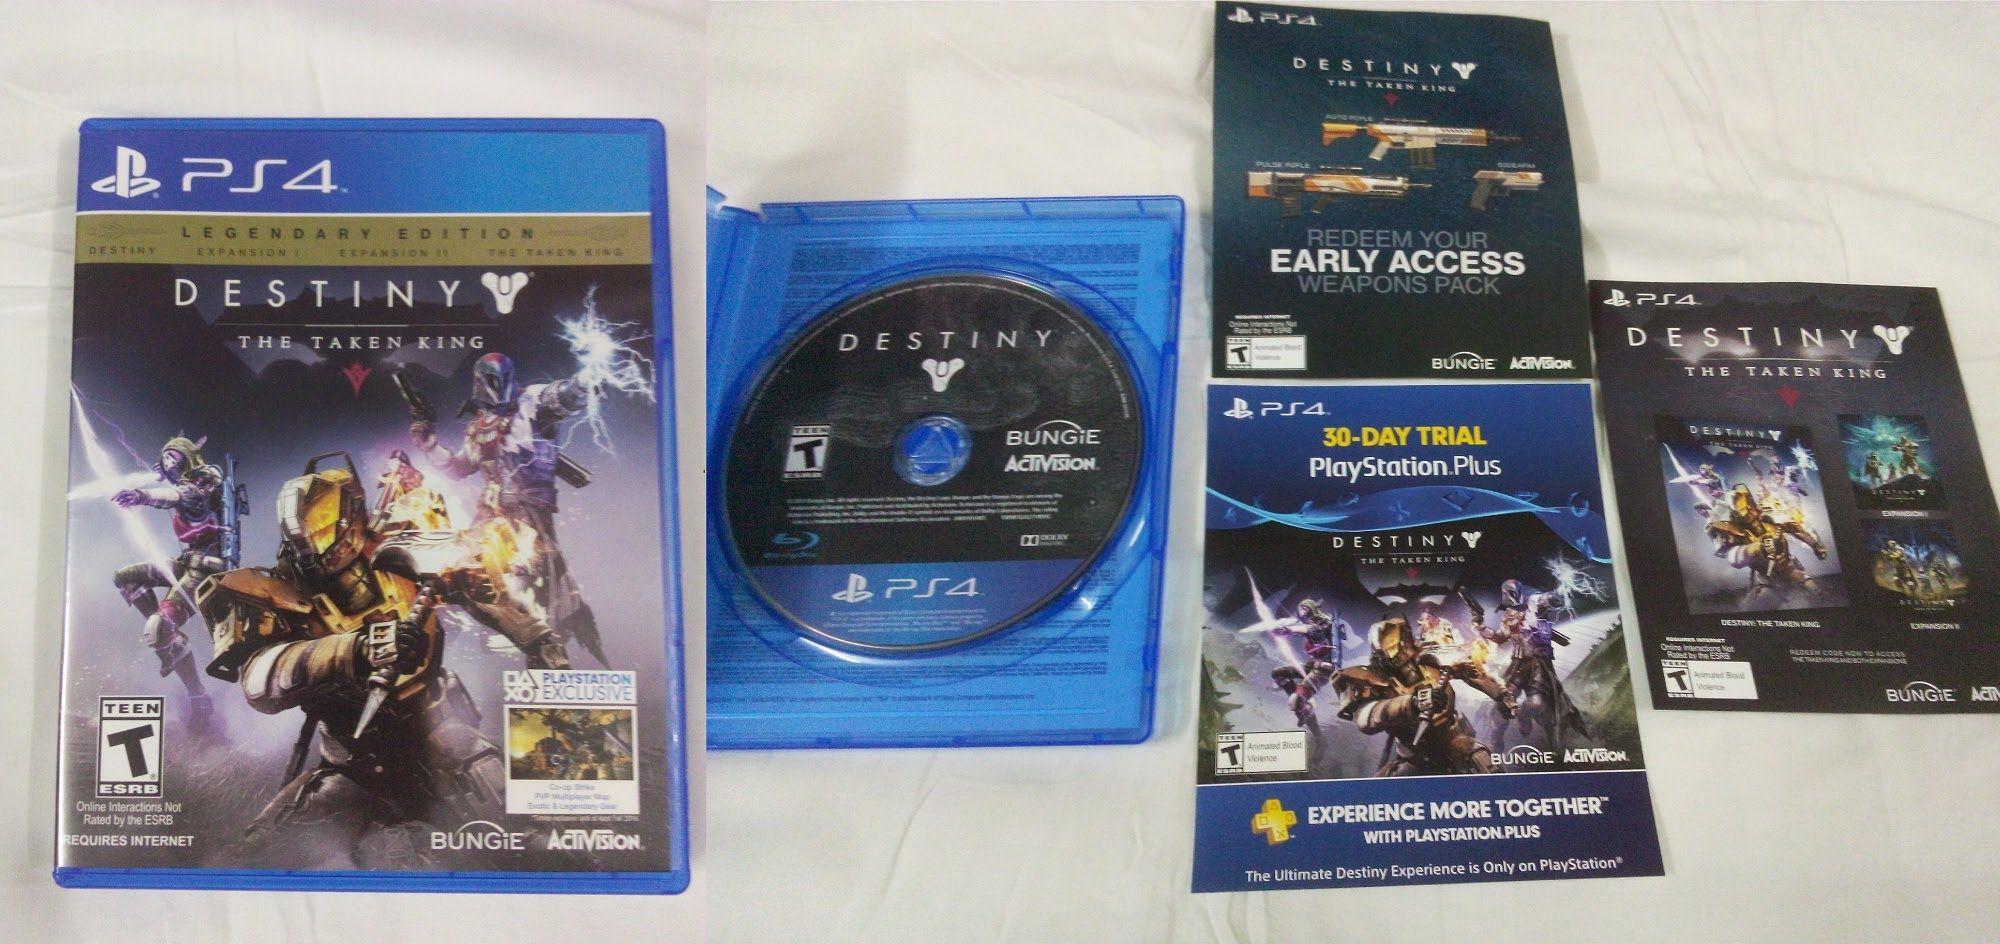 Destiny The Taken King Legendary Edition Ps4 Region All Resident Evil Revelations 3 English Unboxing